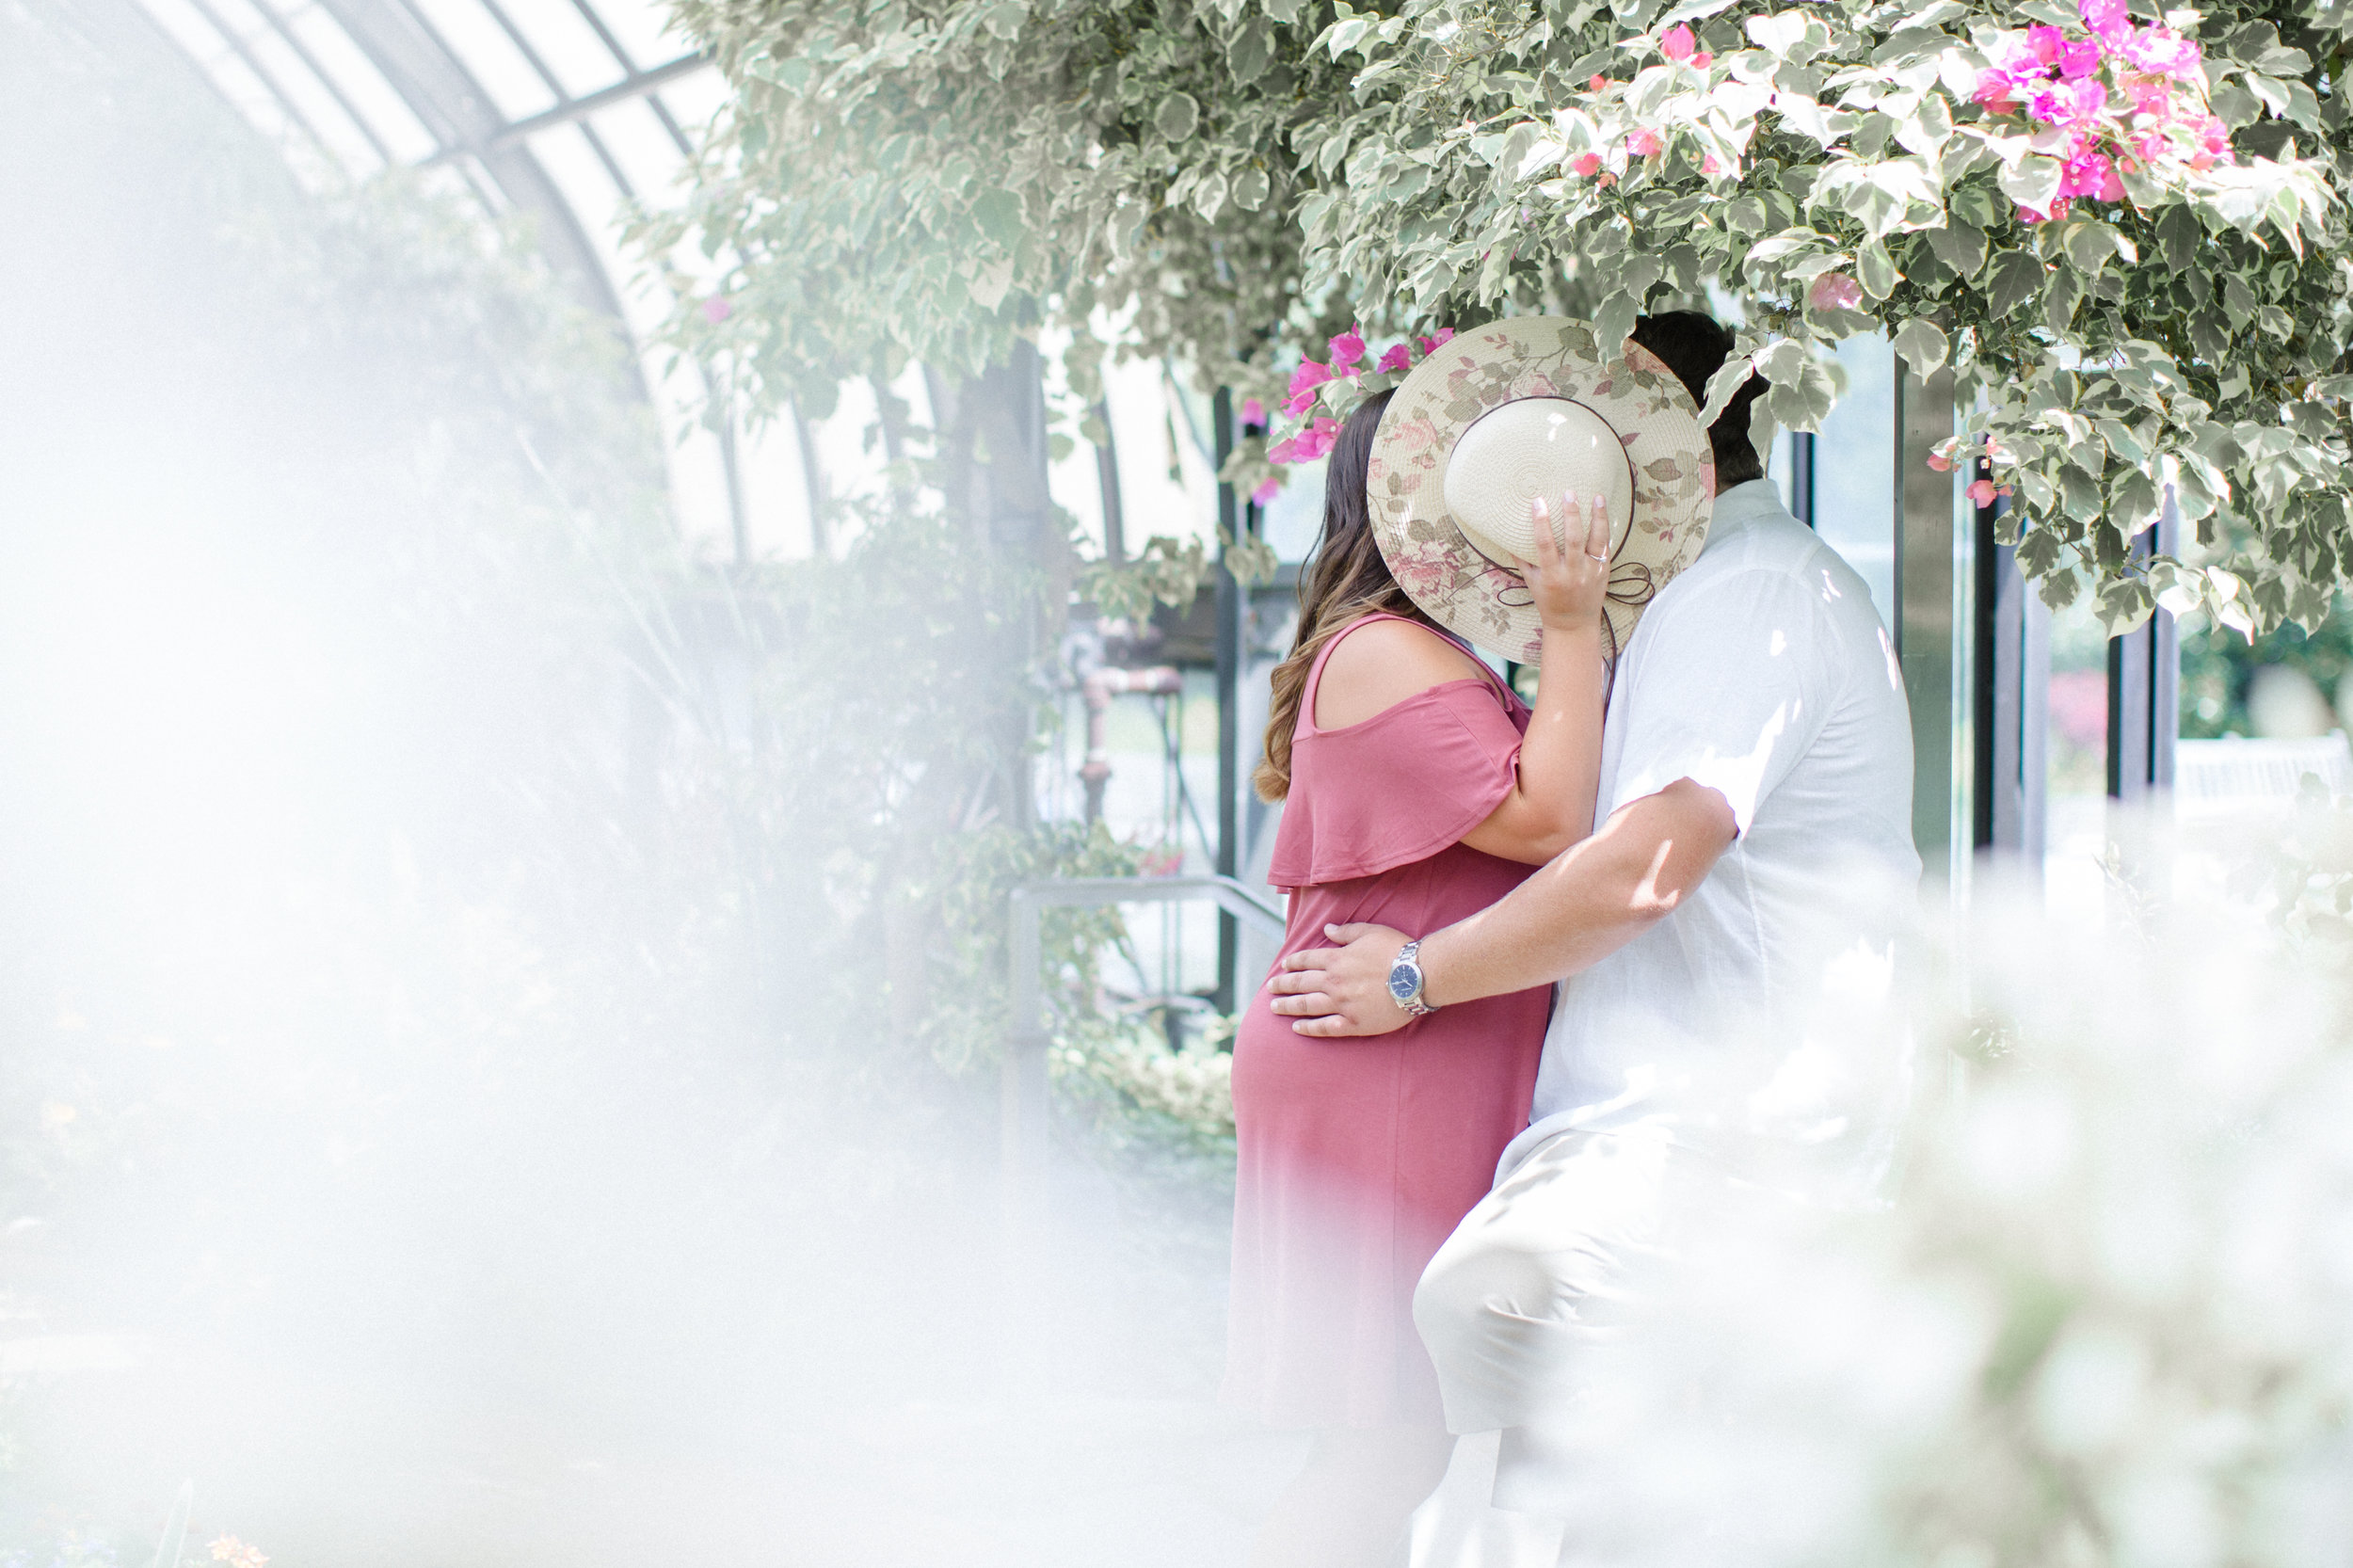 Couple at Longwood Gardens under bougainvillea